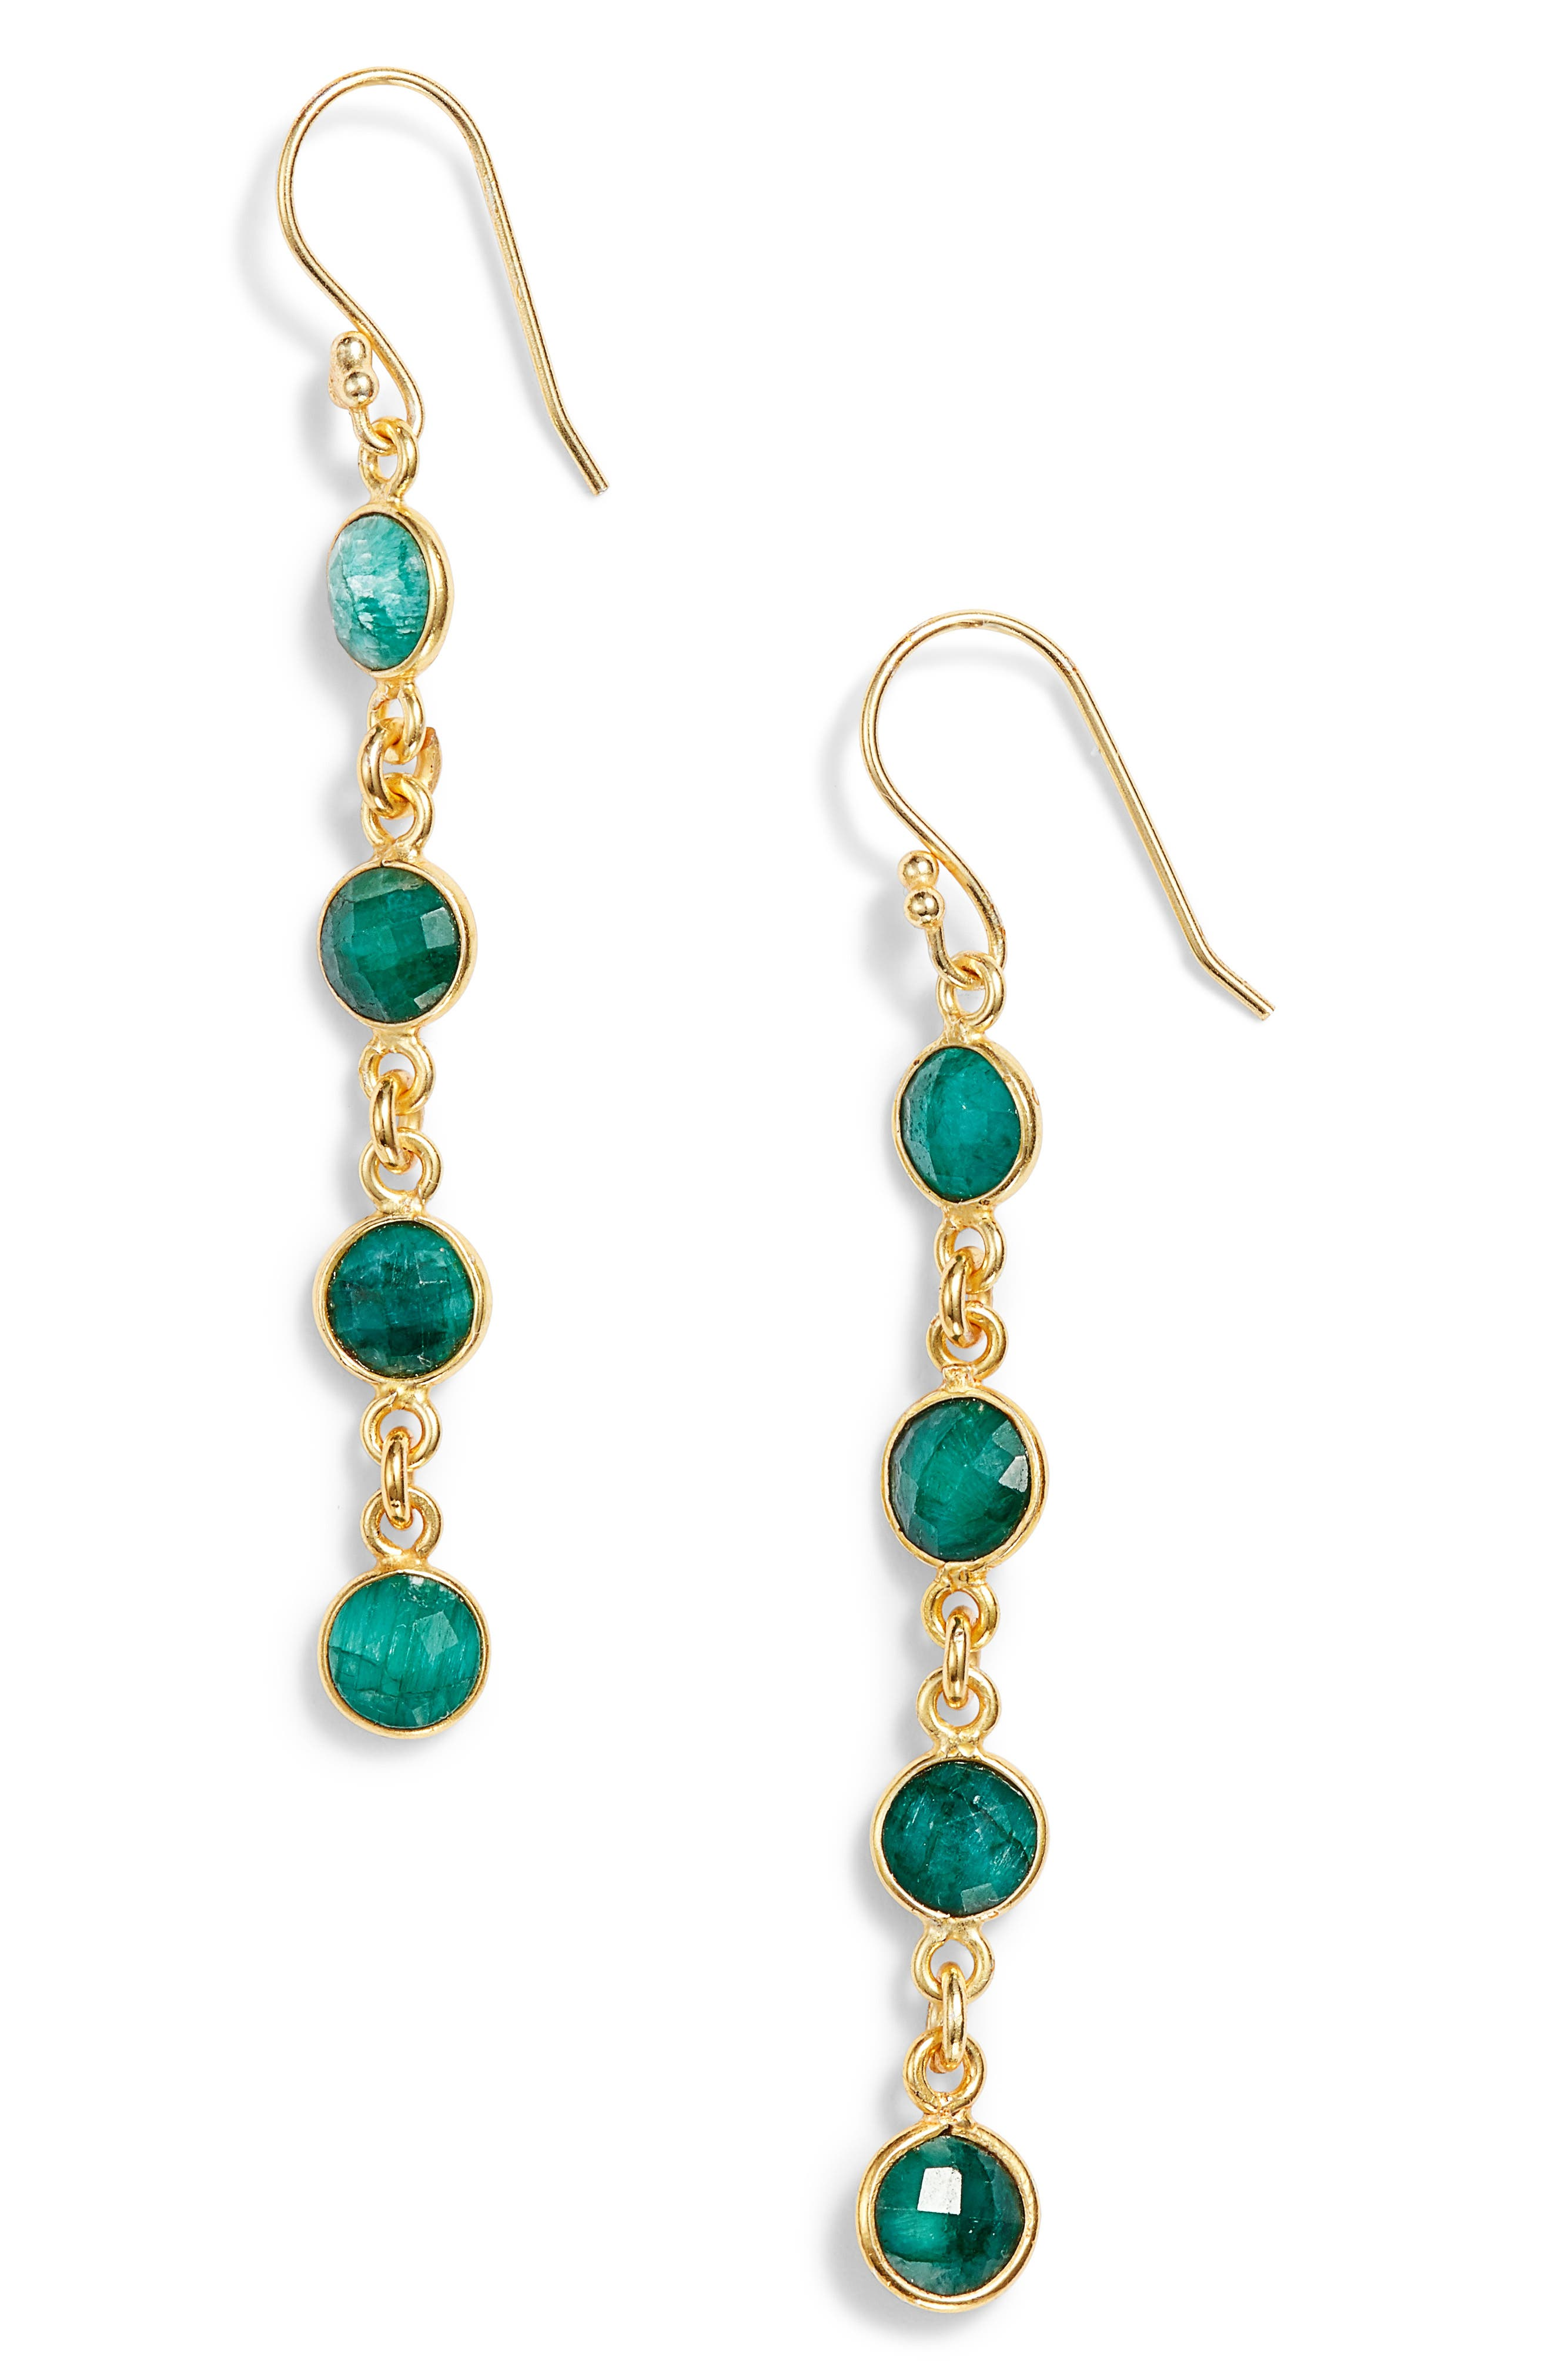 Stone Drop Earrings,                             Main thumbnail 1, color,                             EMERALD